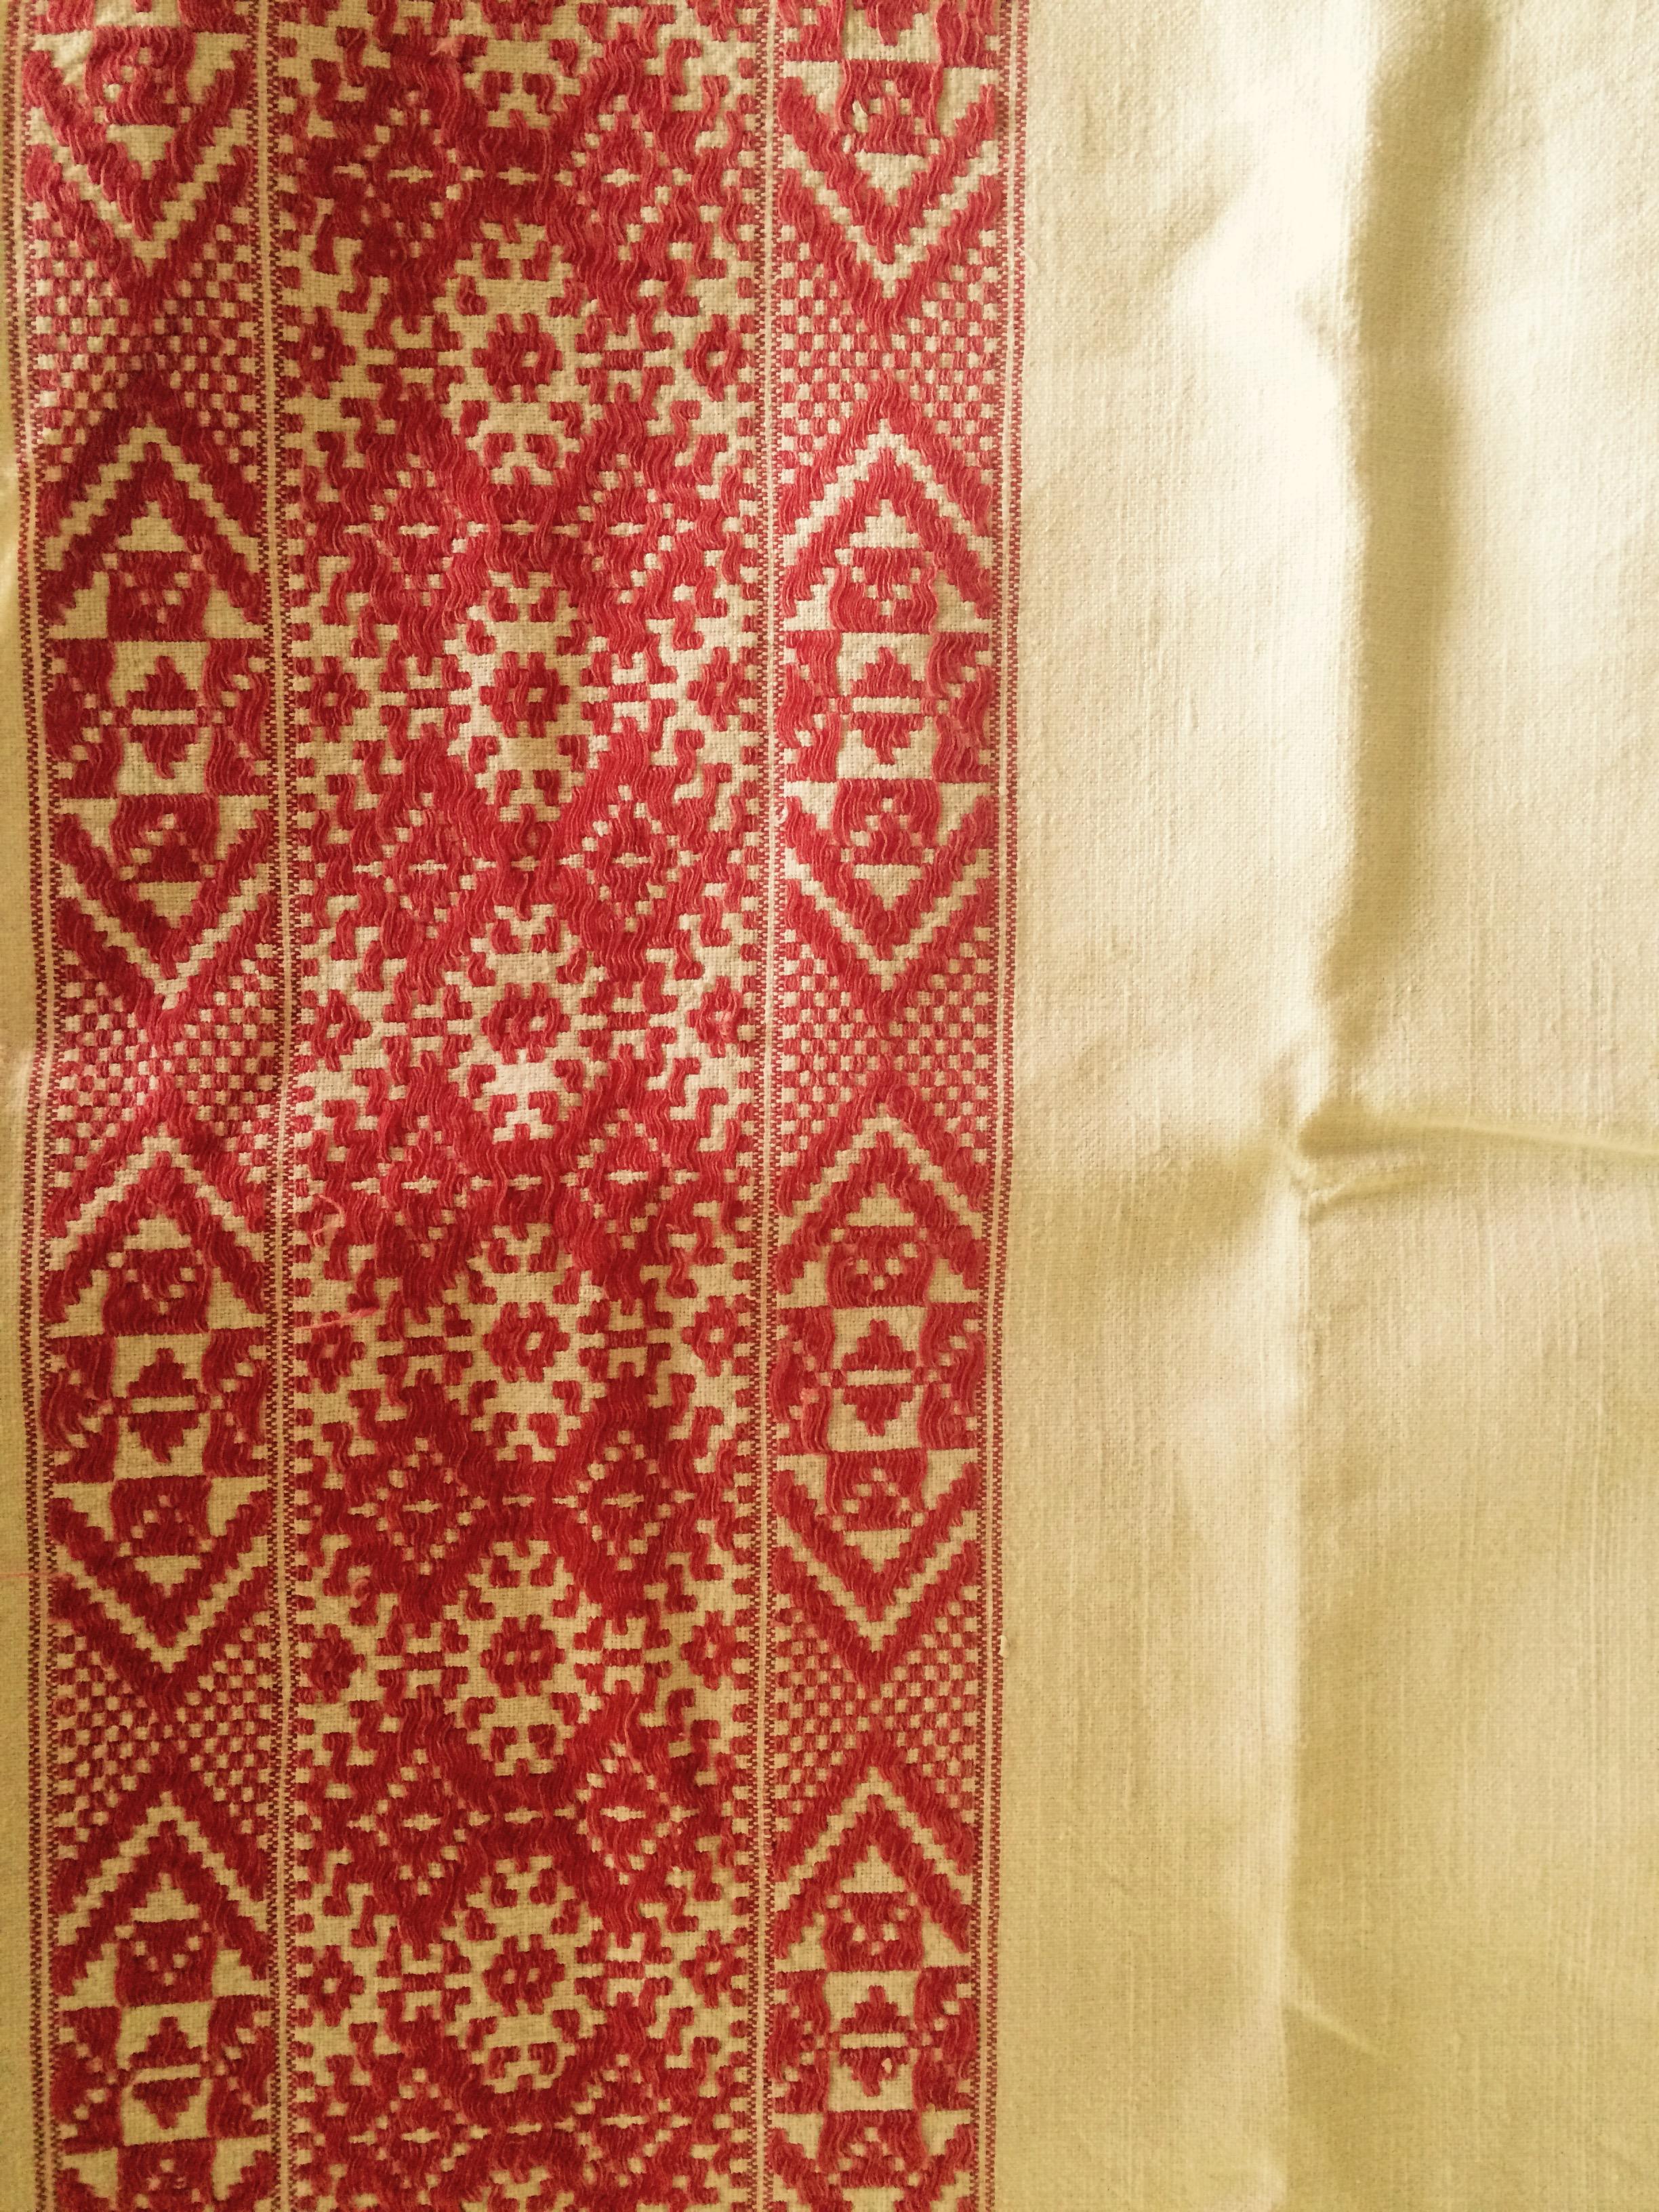 Славянская обережная вышивка - Страница 25 Xkujgy